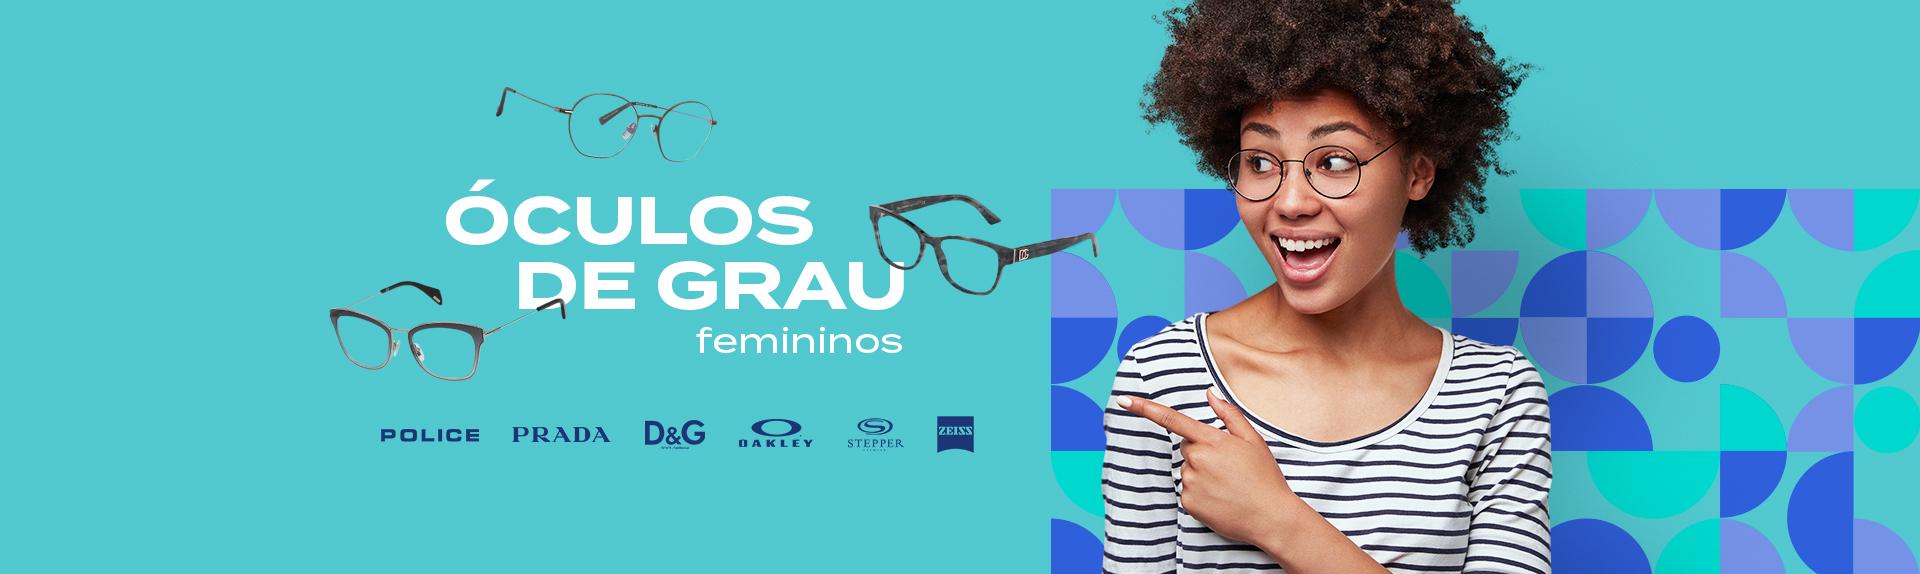 Banner óculos grau feminino